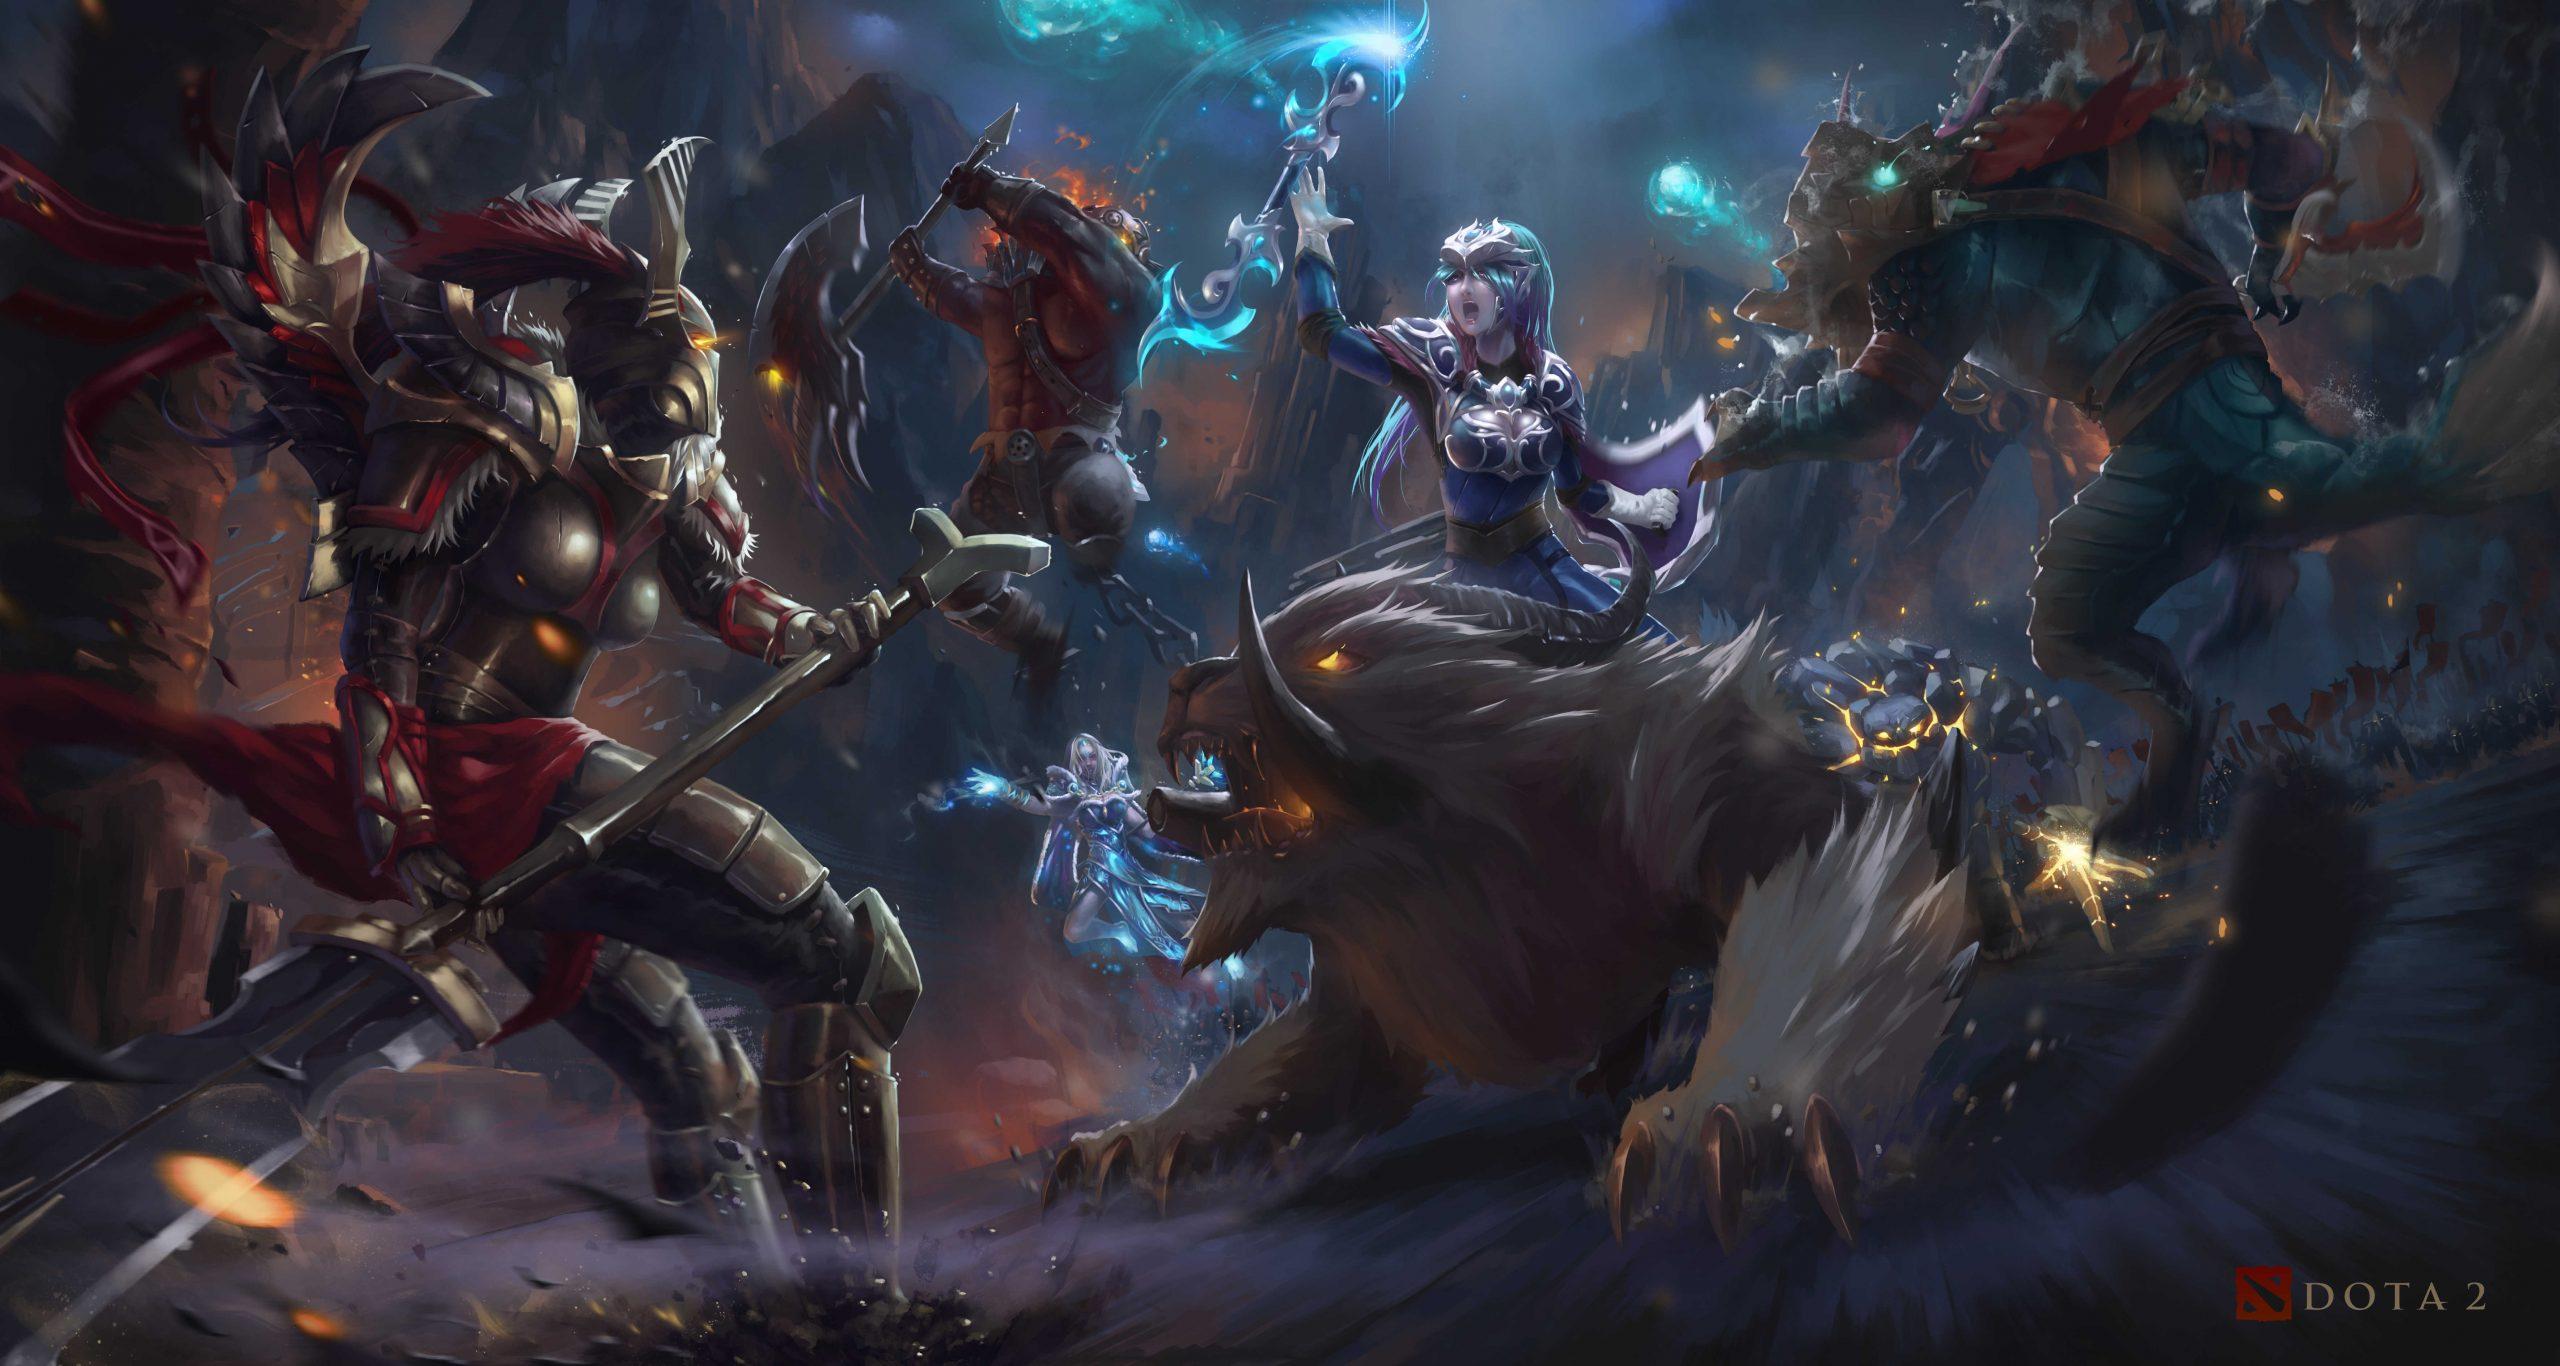 Arc Warden 4k 2 Monster Night Dota2 Artwork Dota 2 Arc Warden Hd Wallpaper & Background Download Dota